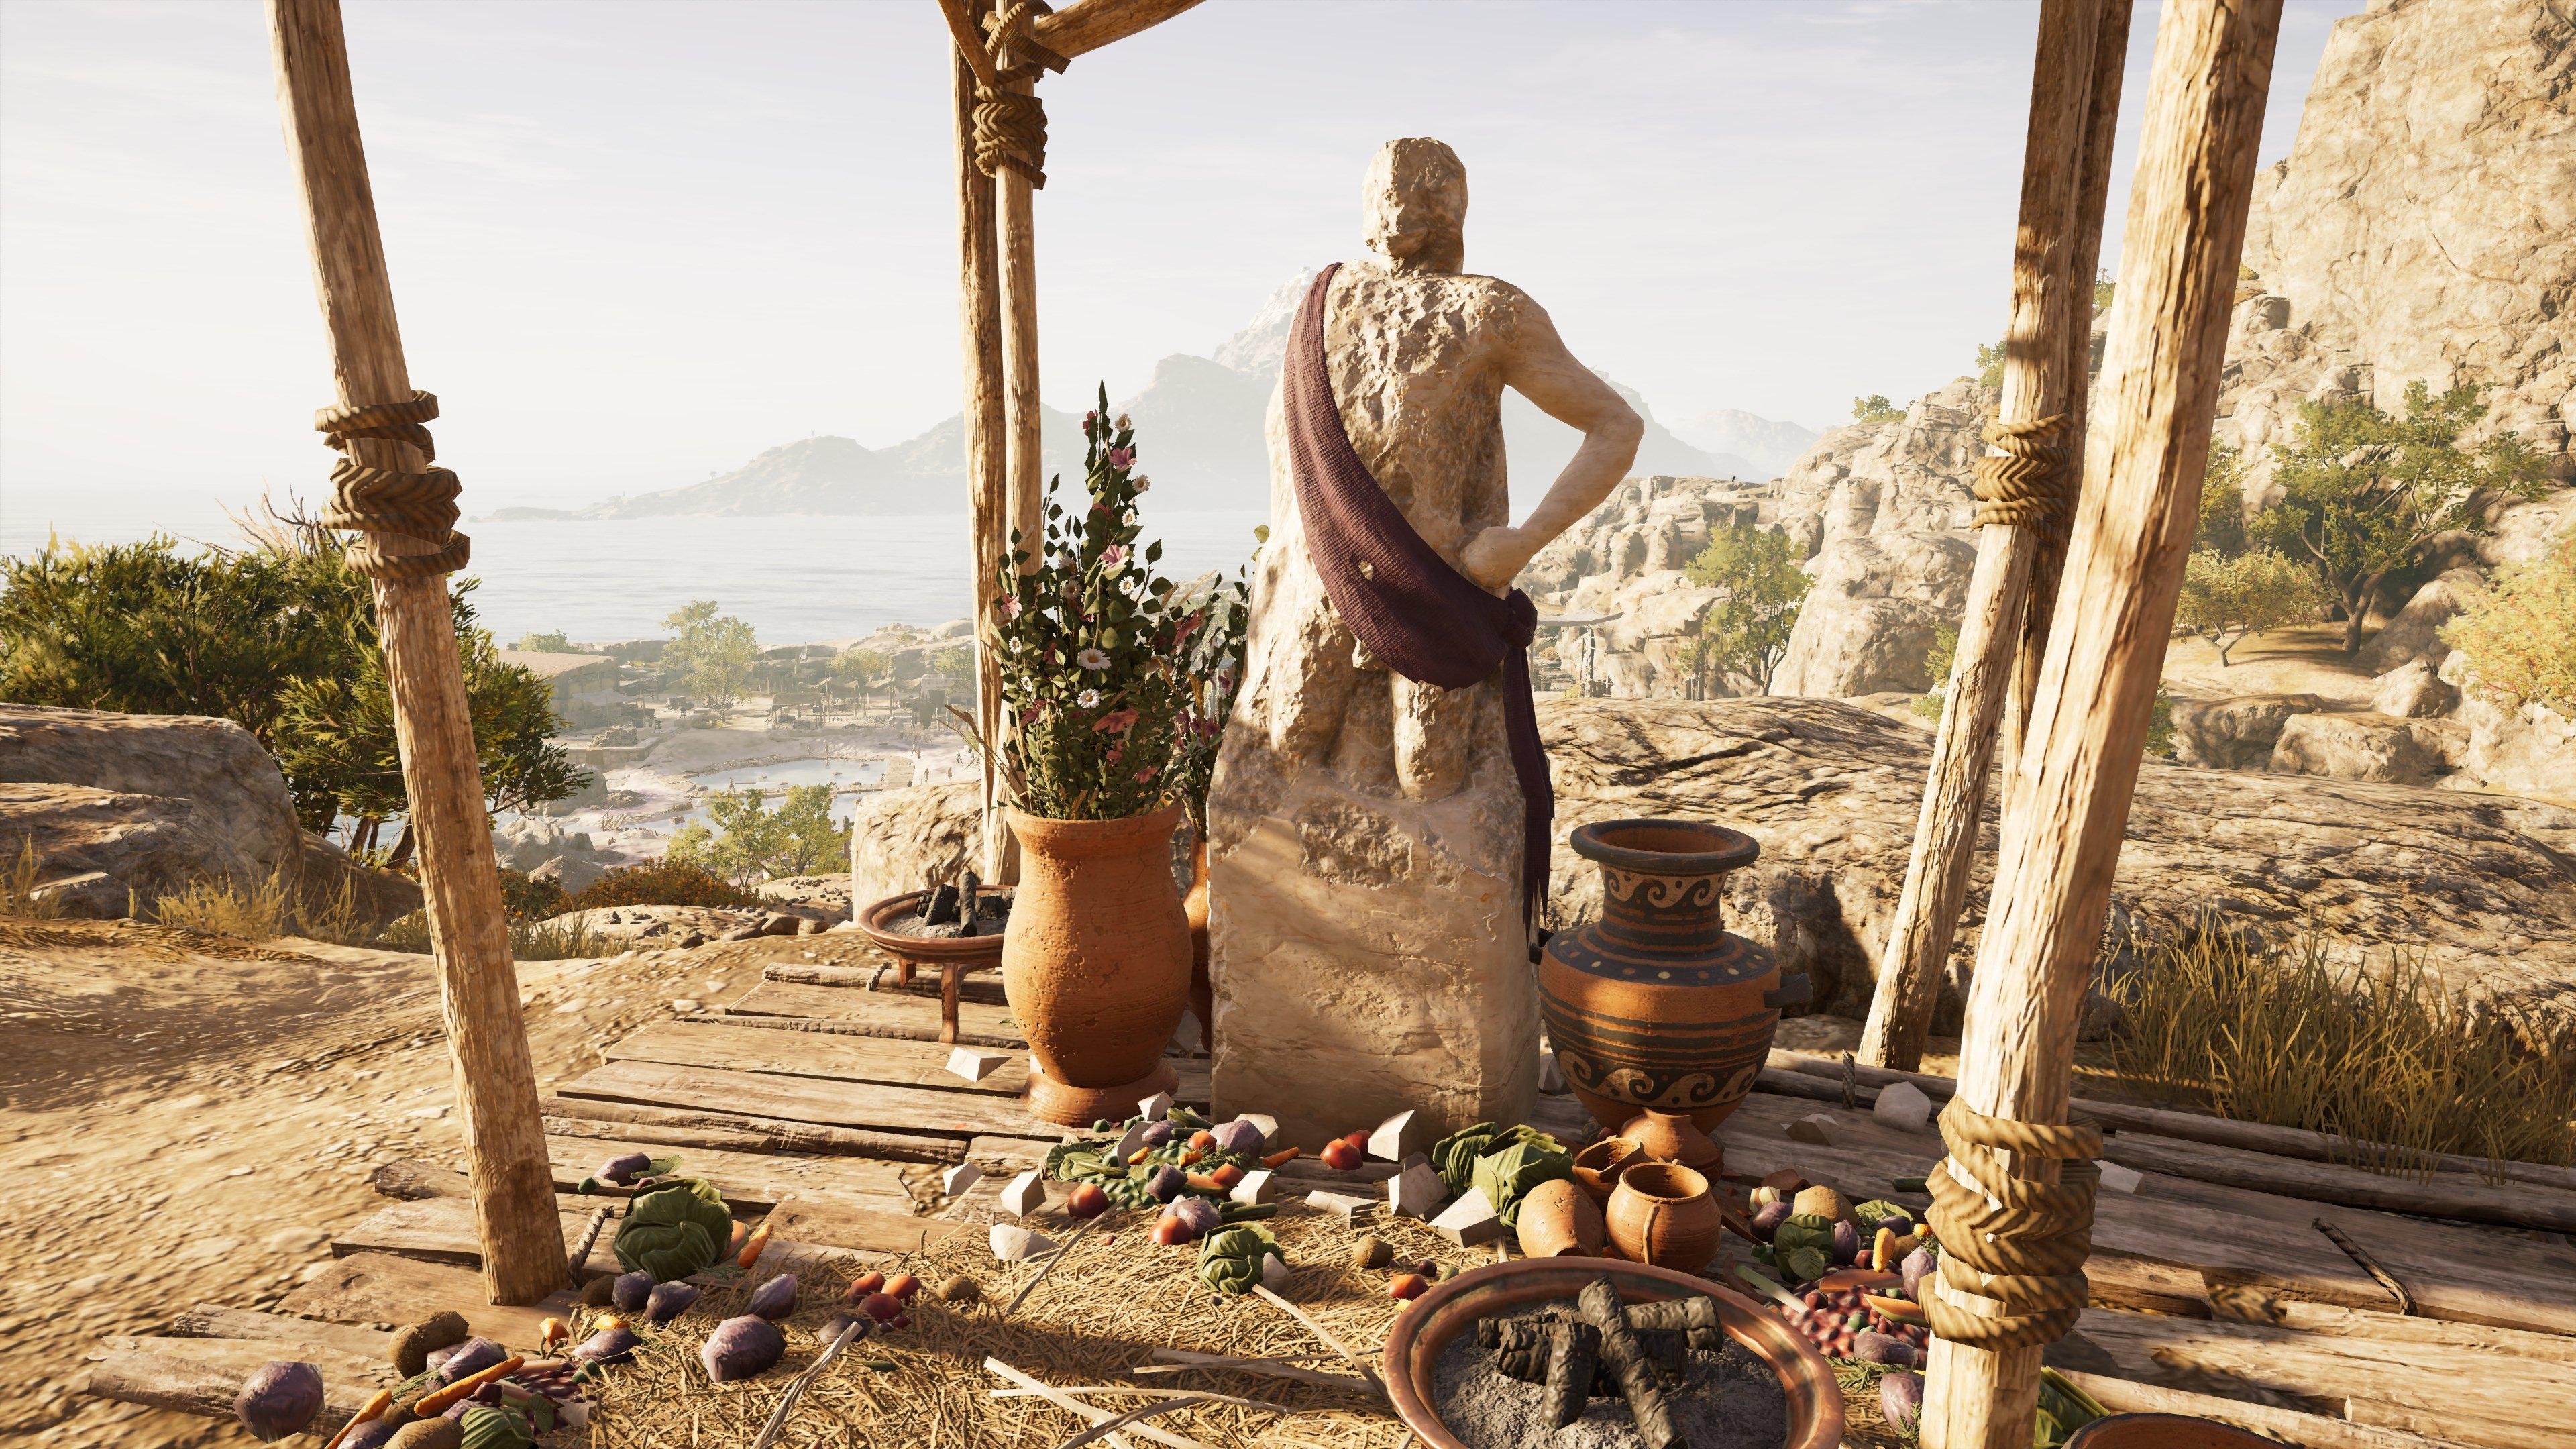 Statue of Empedokles